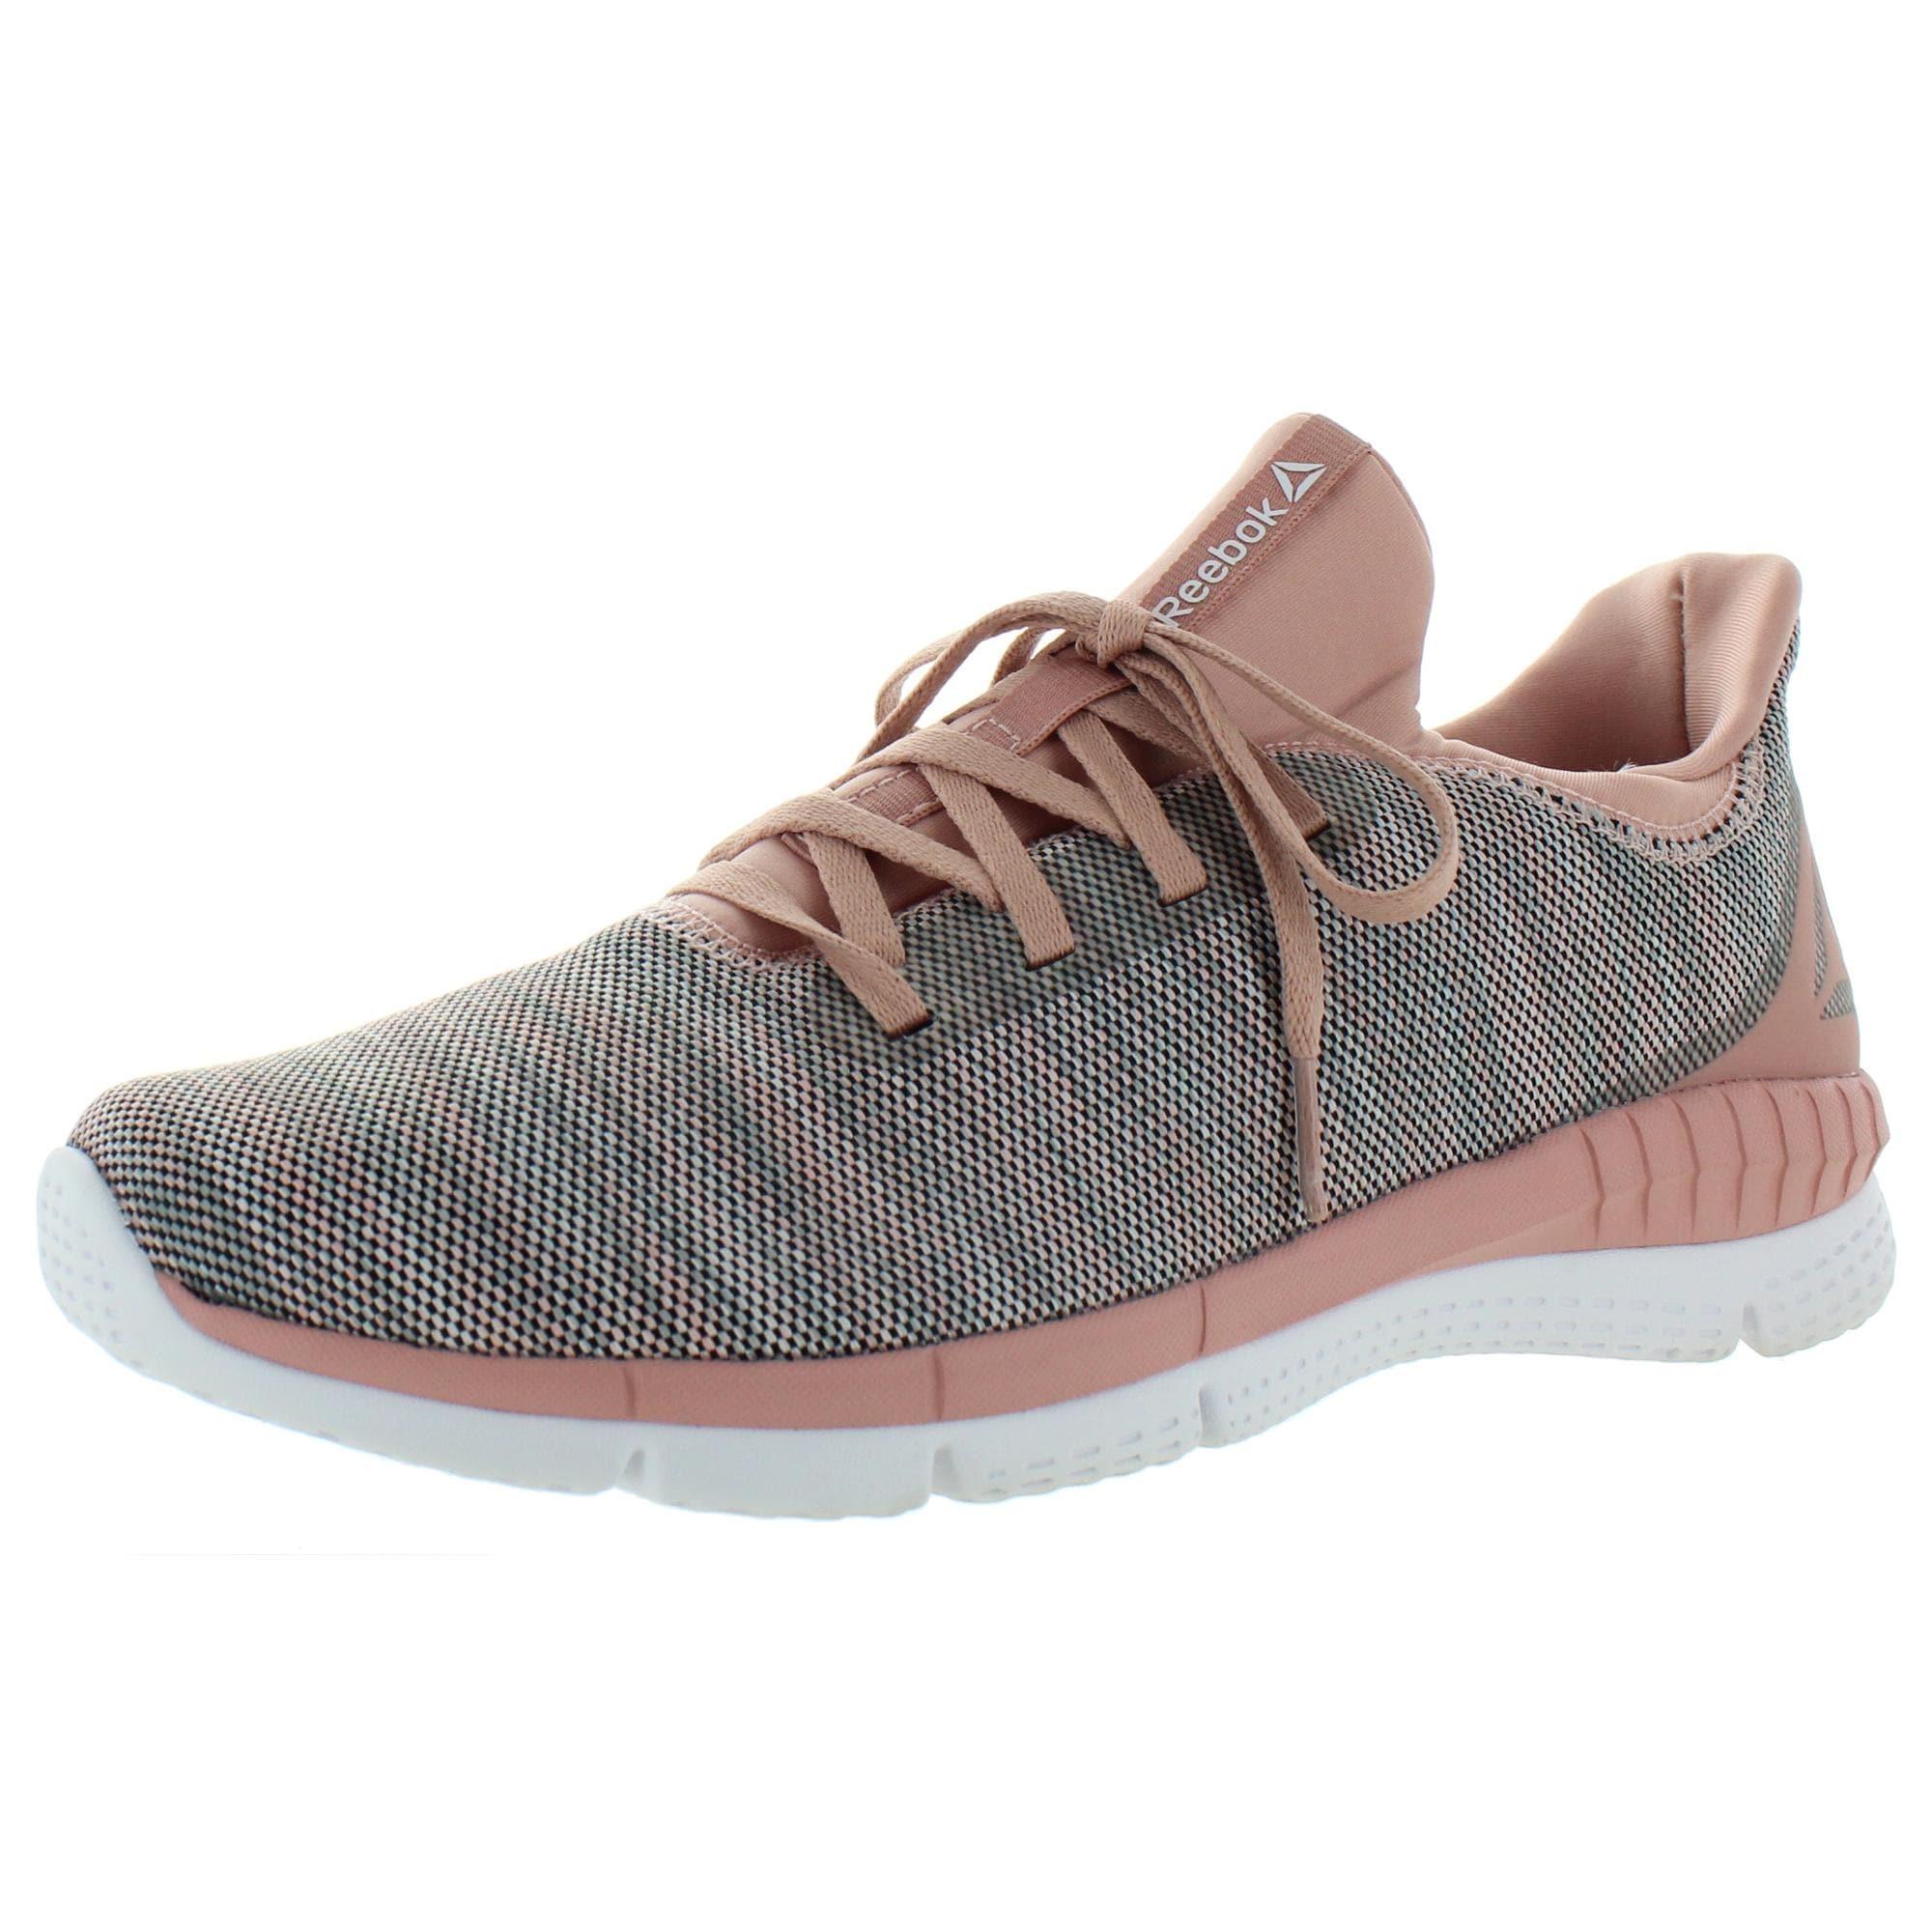 essenza Pilastro abuso  Shop Reebok Womens Sprint 2.0 Running Shoes Knit Low Top - Pink/Grey Multi  - Overstock - 31705172 - 6 Medium (B,M)